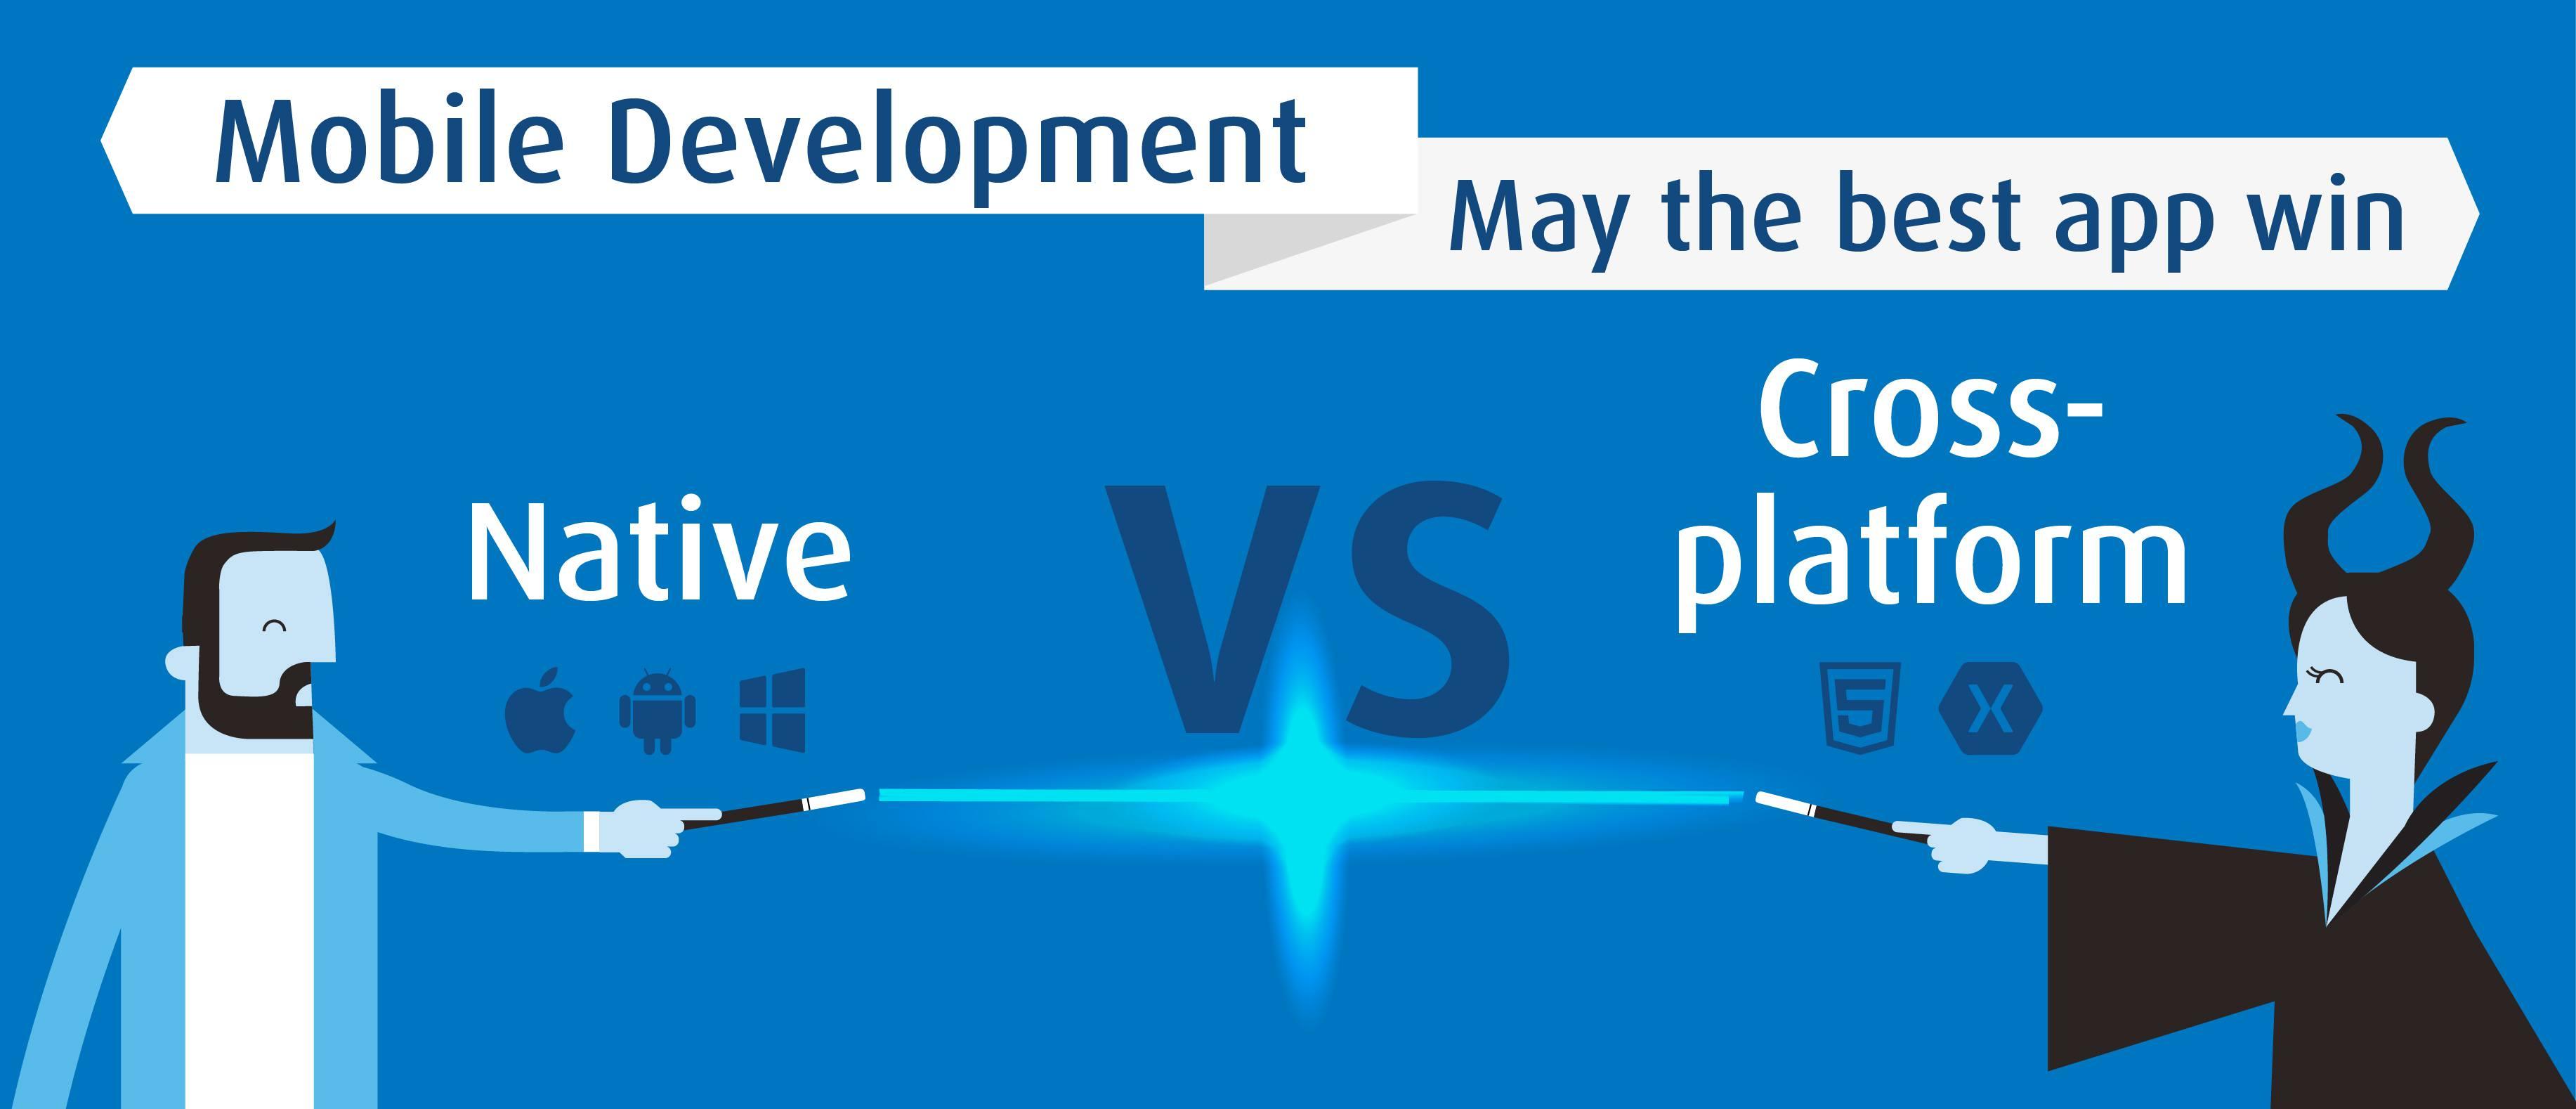 mobile-development-poland-native-cross-platform